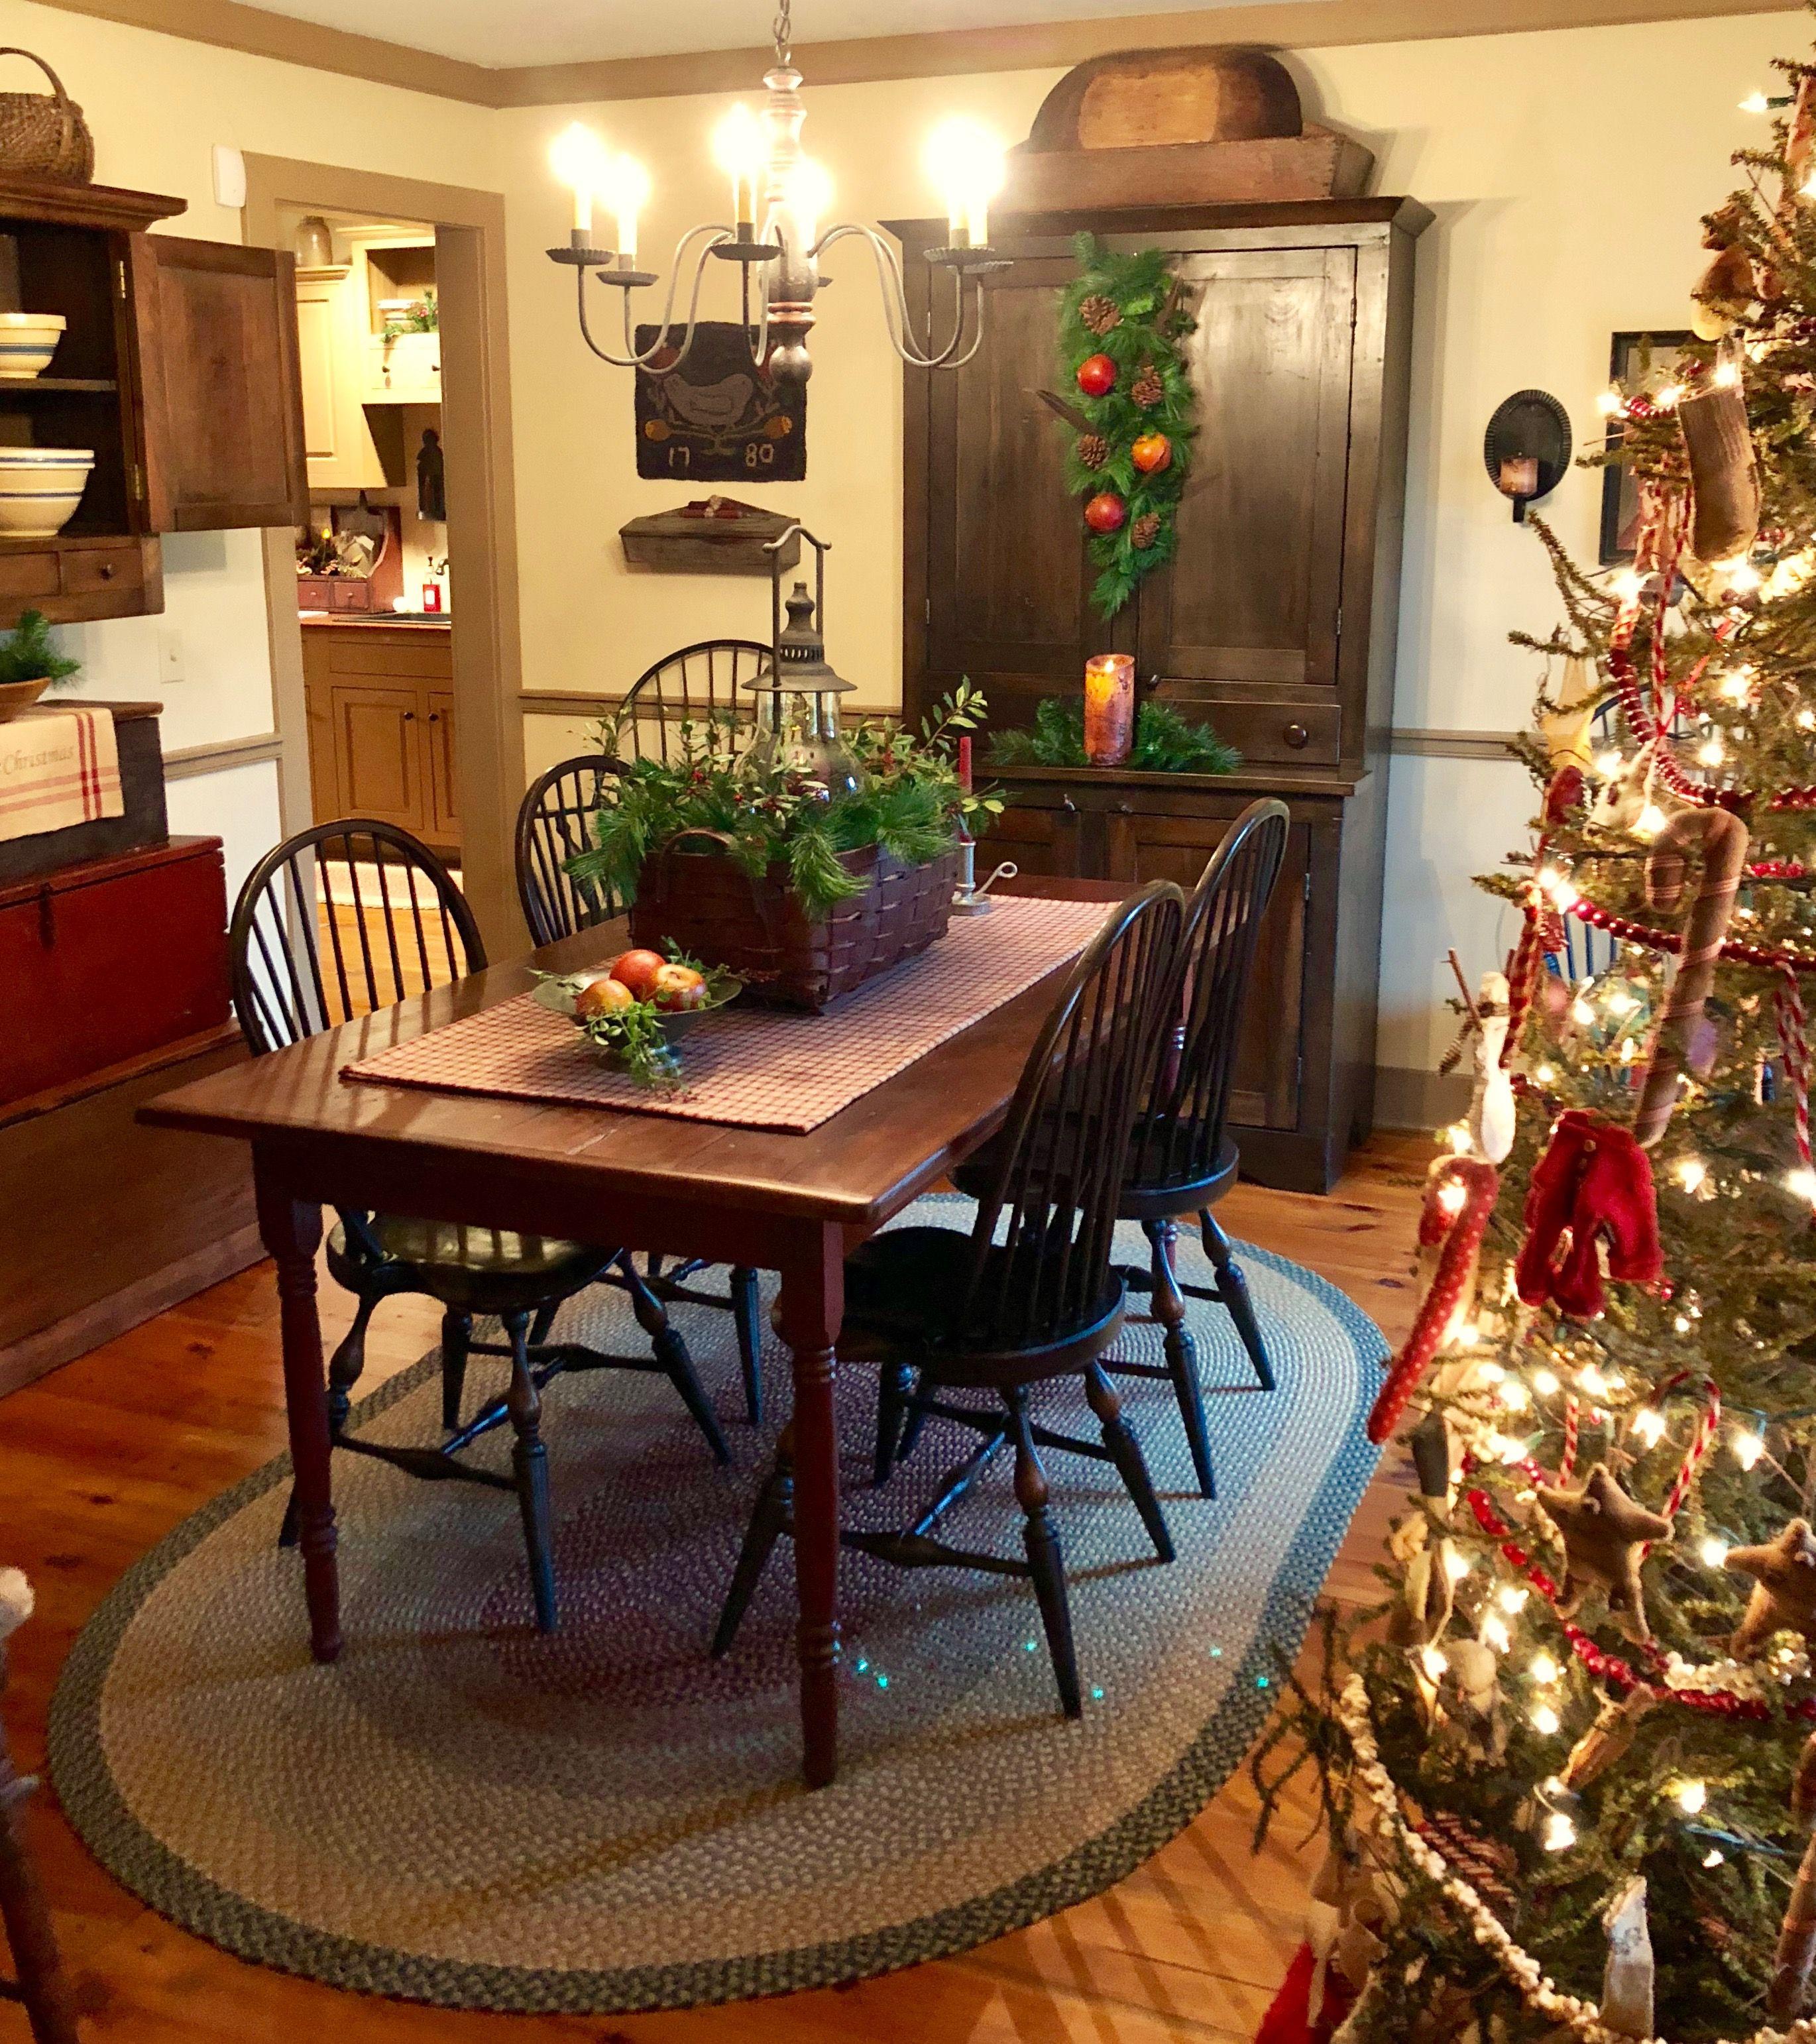 Primitive Dining Room Furniture: #PrimitiveDiningRooms #PrimDecor